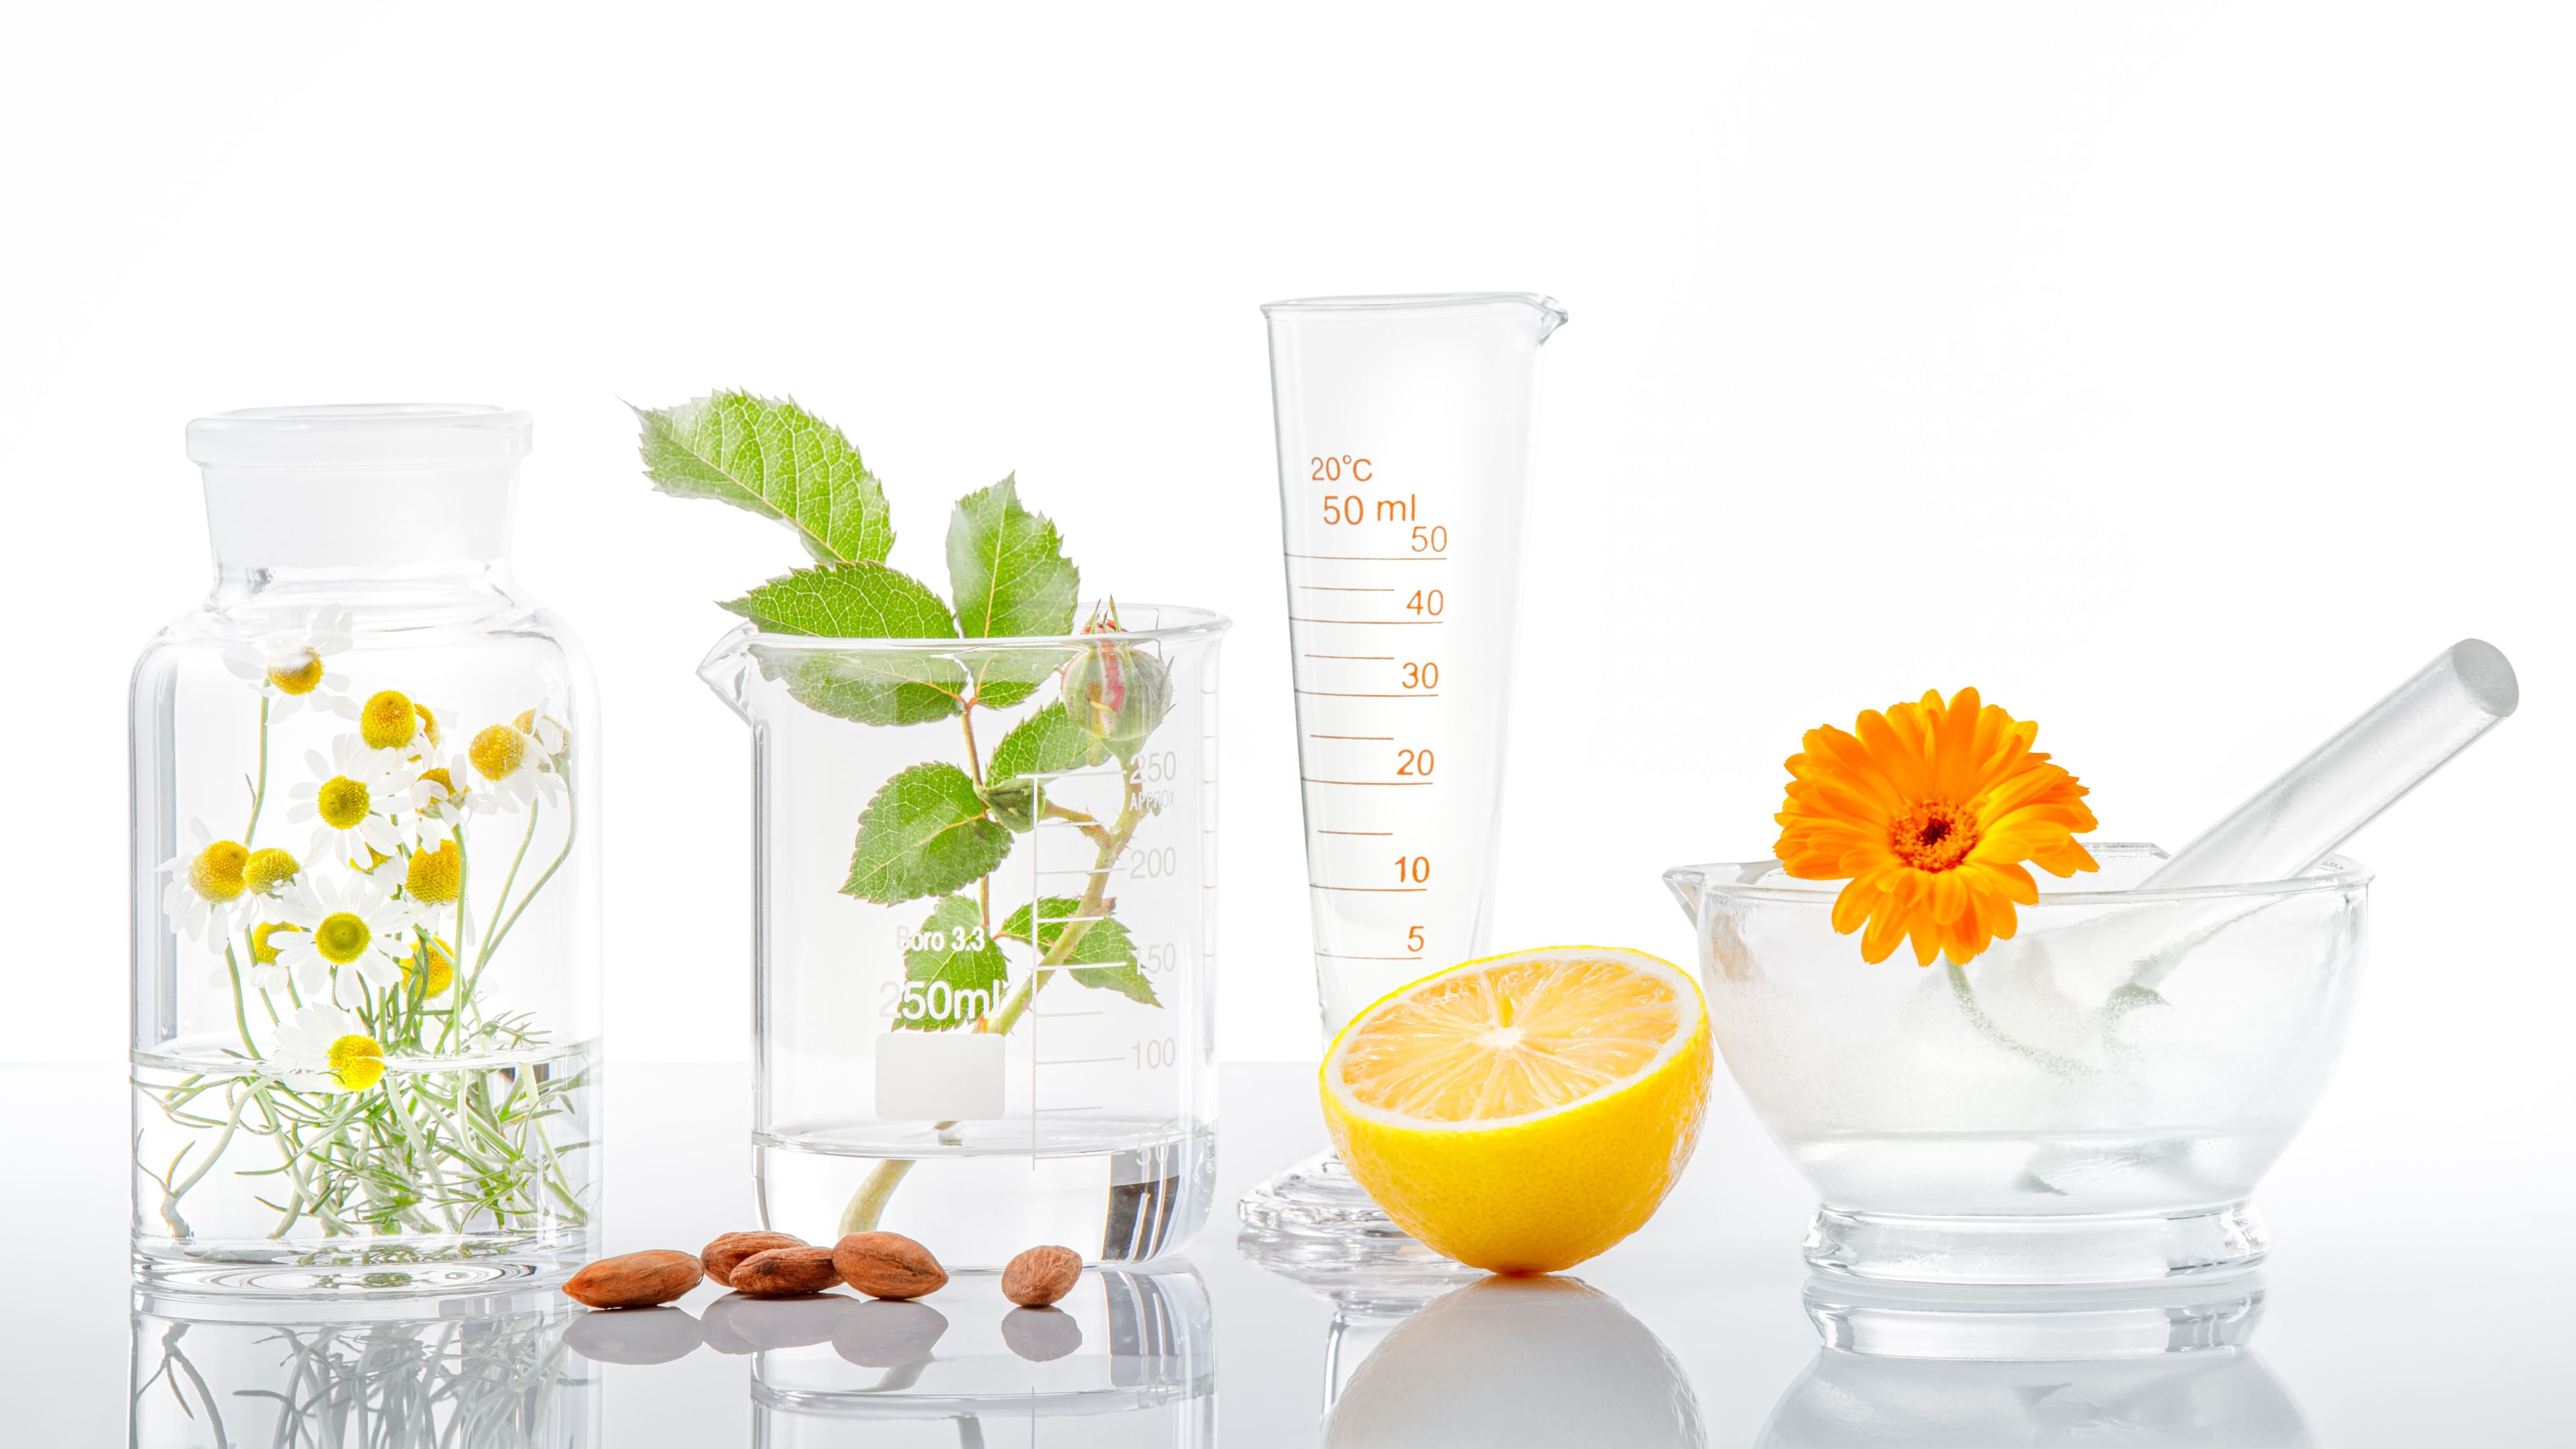 Holistic Pharmacy Supplies